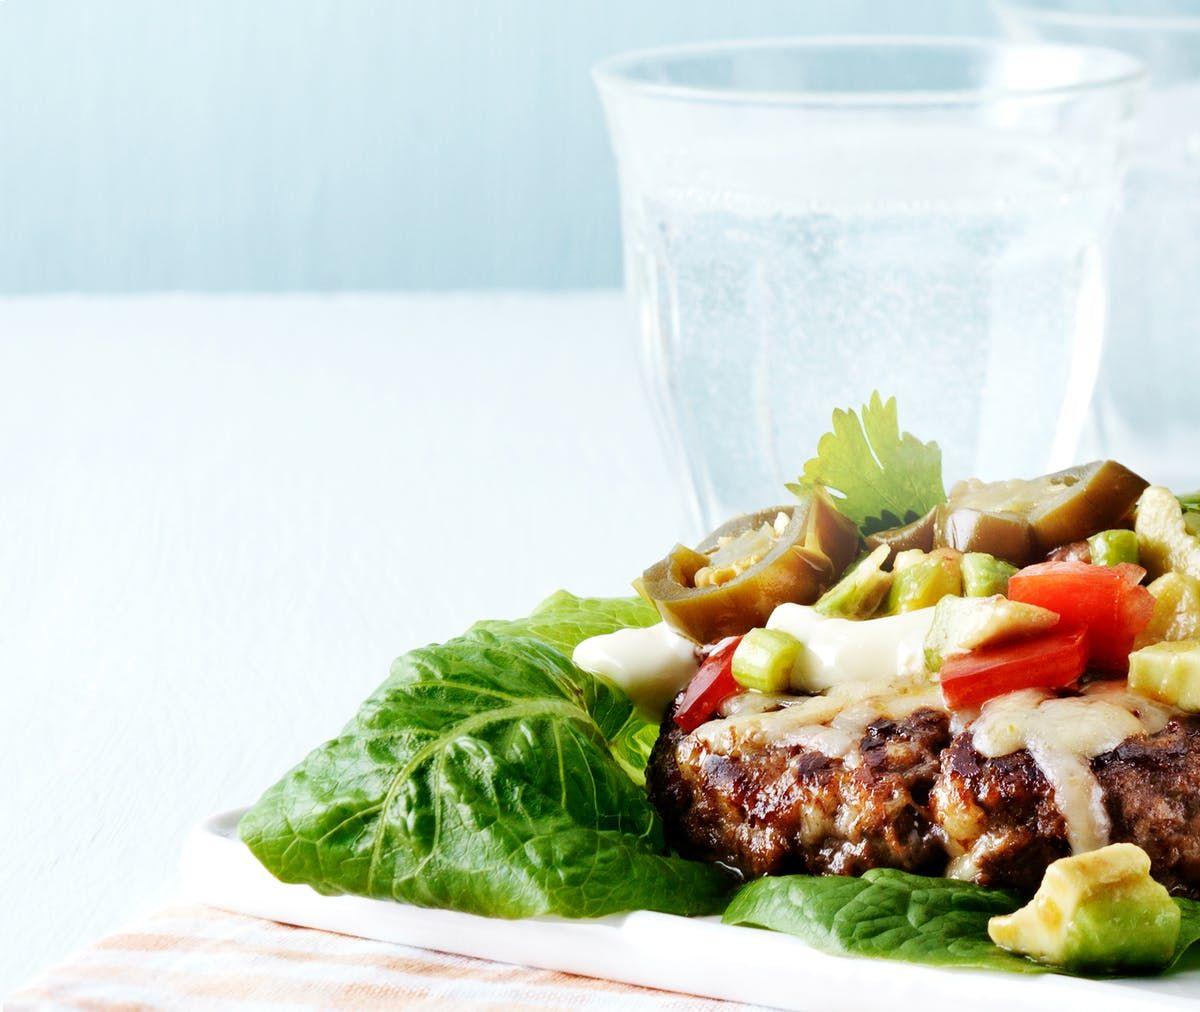 Dieta cetogenica diet doctor